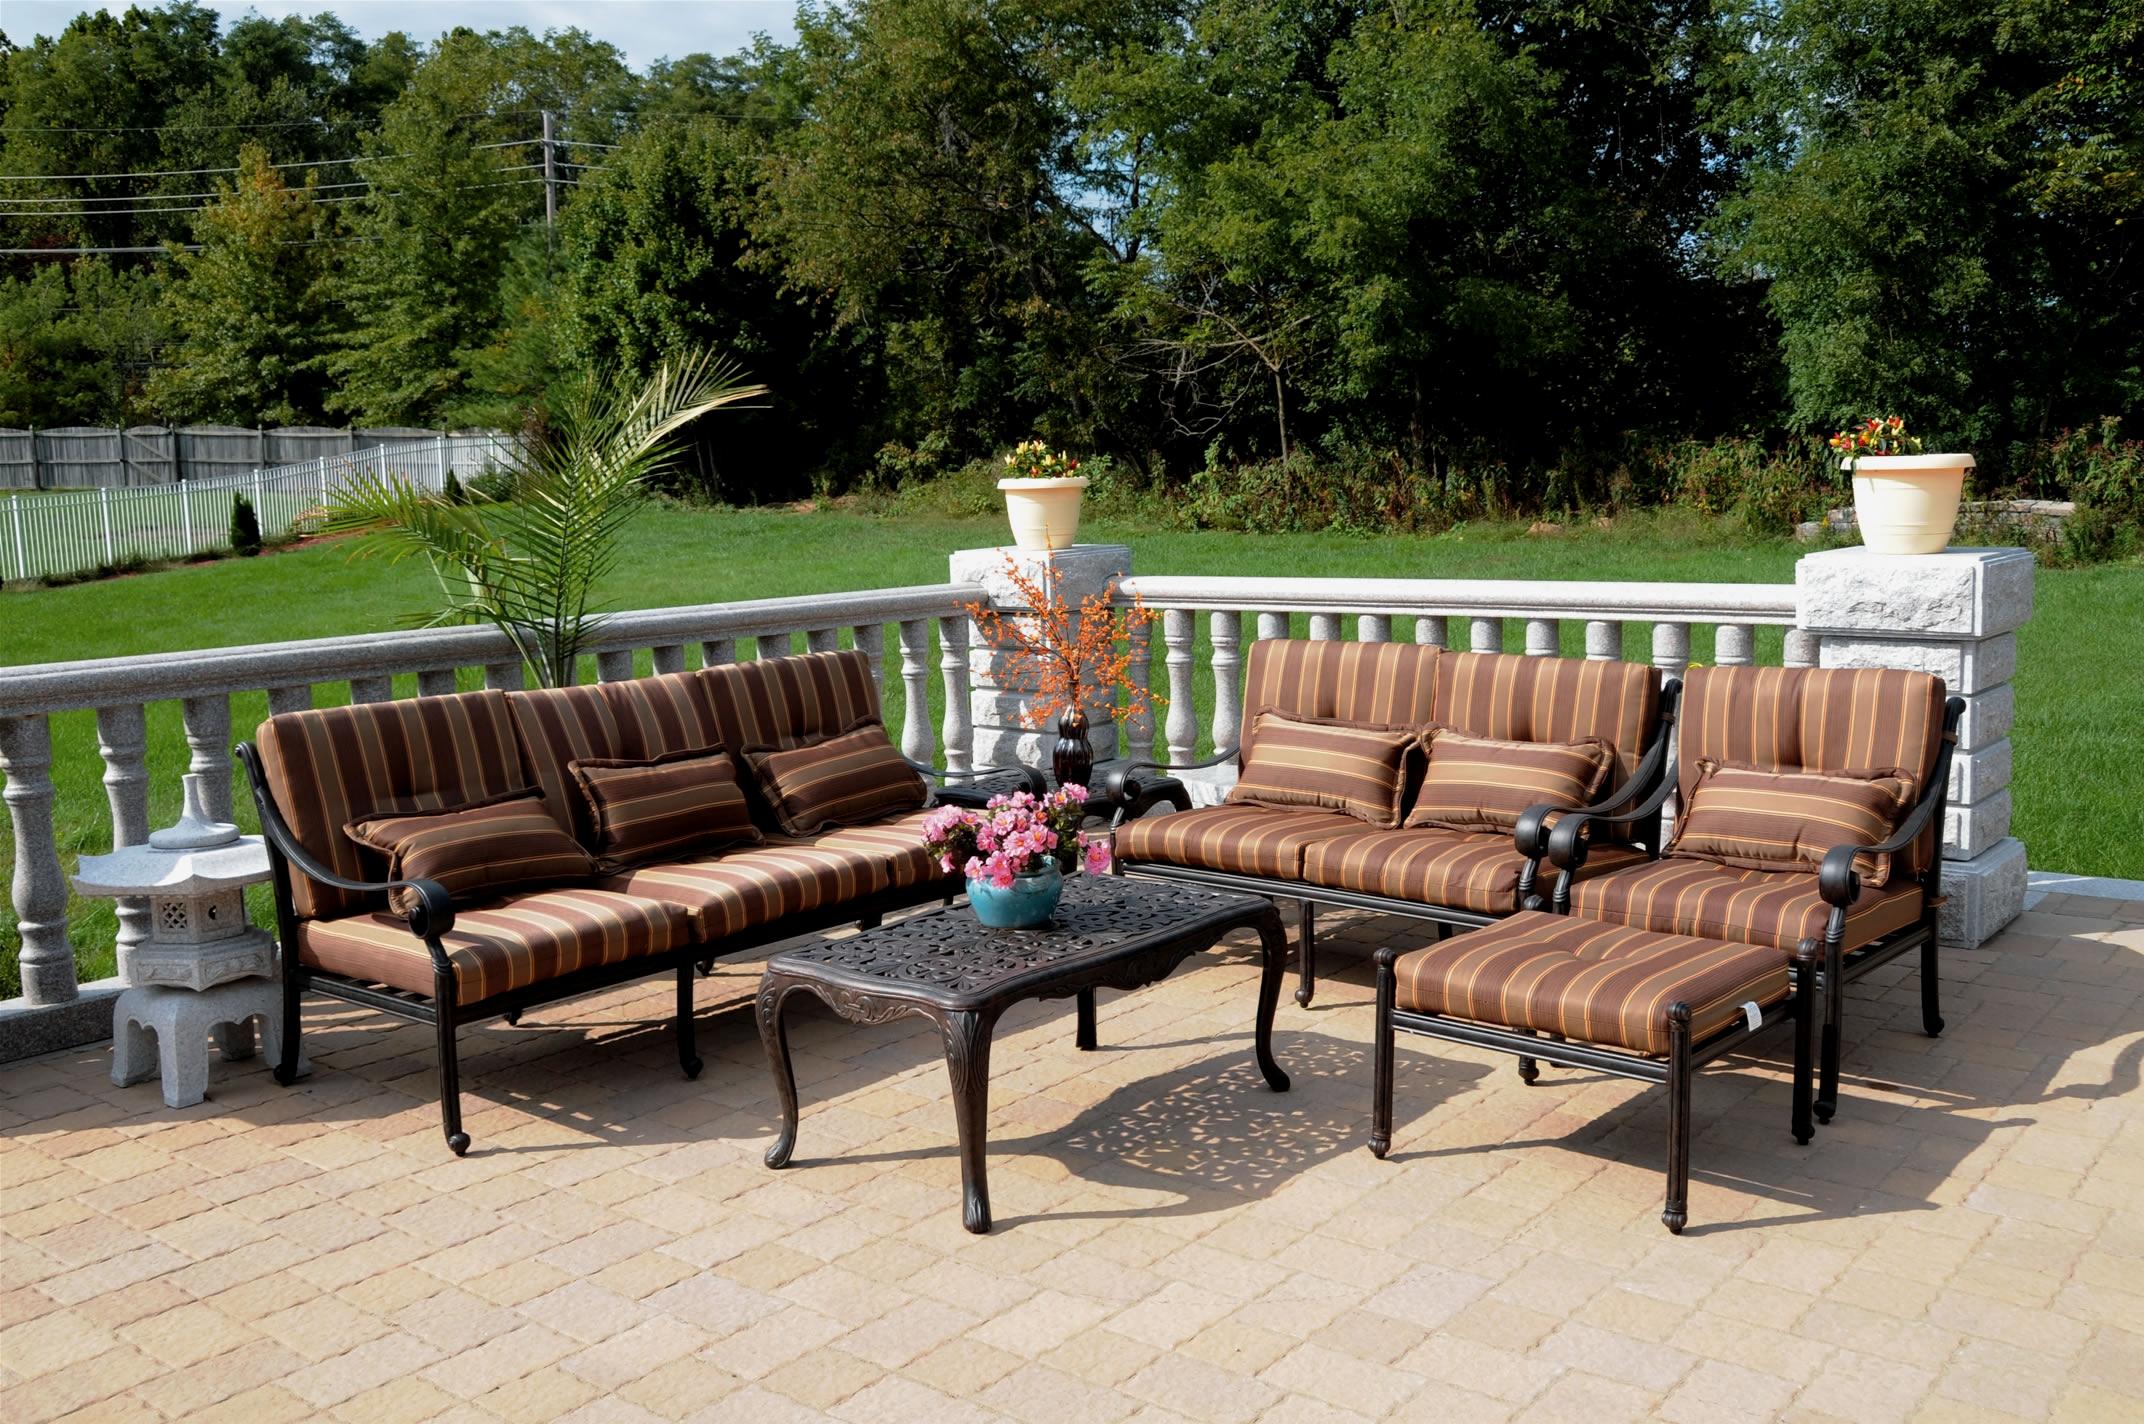 Patio furniture deep seating set cast aluminum 6pc dwl for Deep seating patio furniture